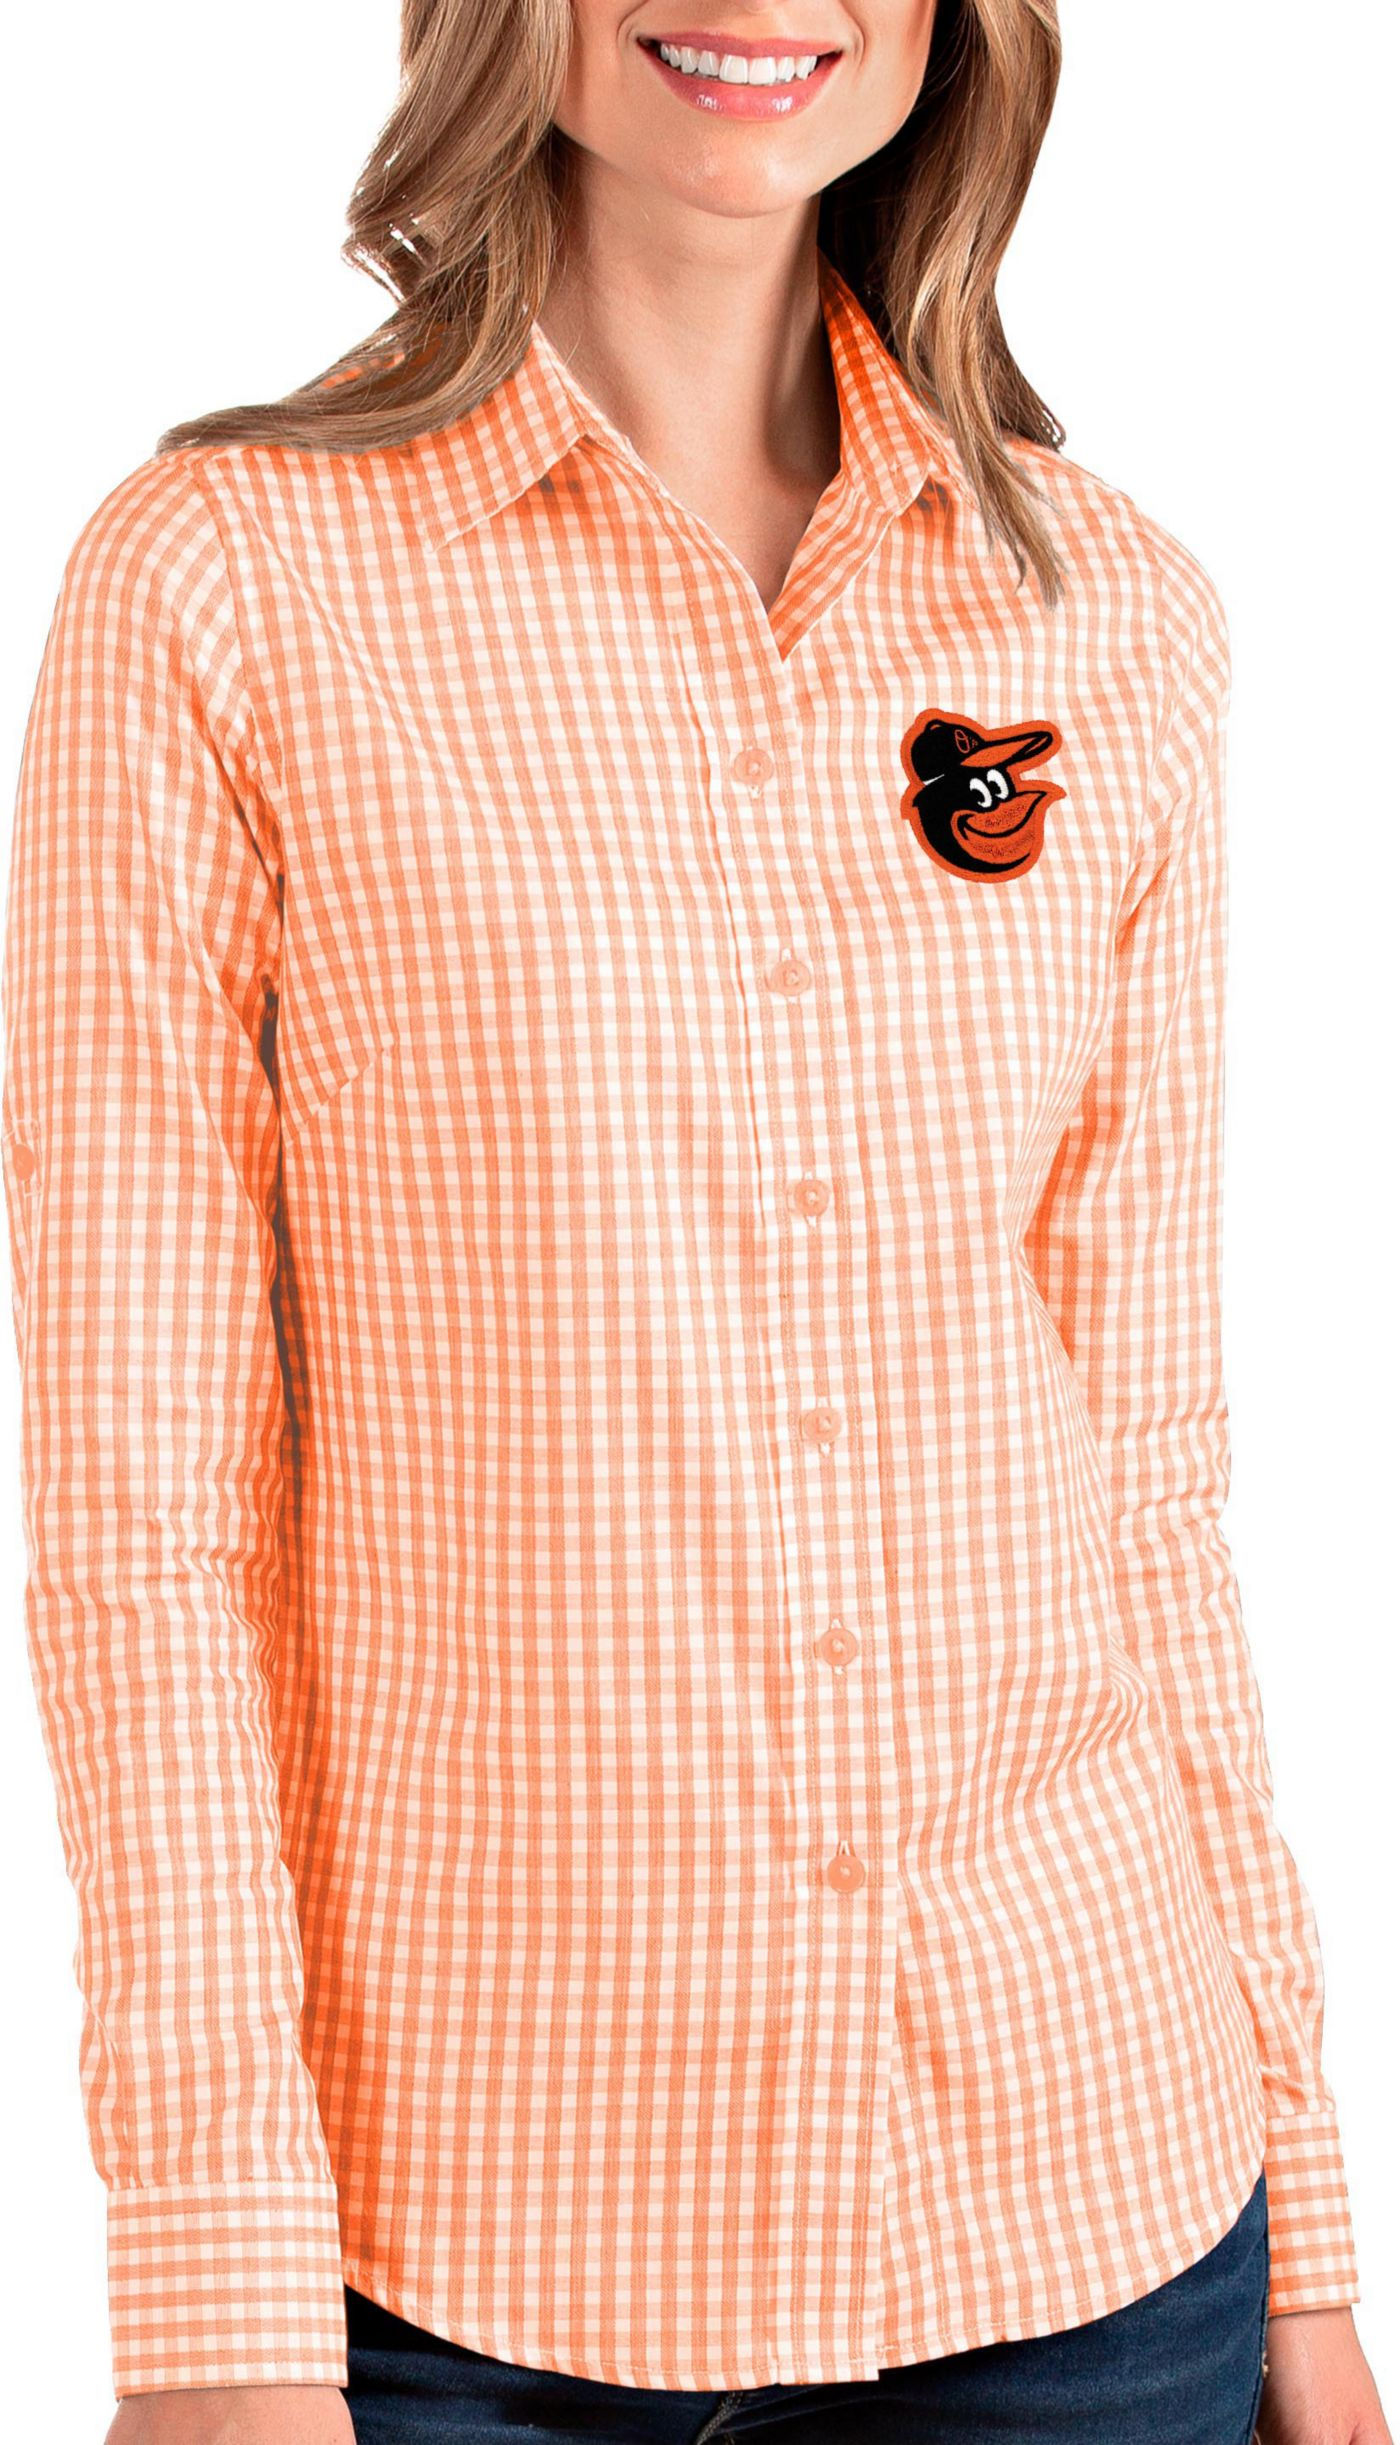 Antigua Women's Baltimore Orioles Structure Button-Up Orange Long Sleeve Shirt